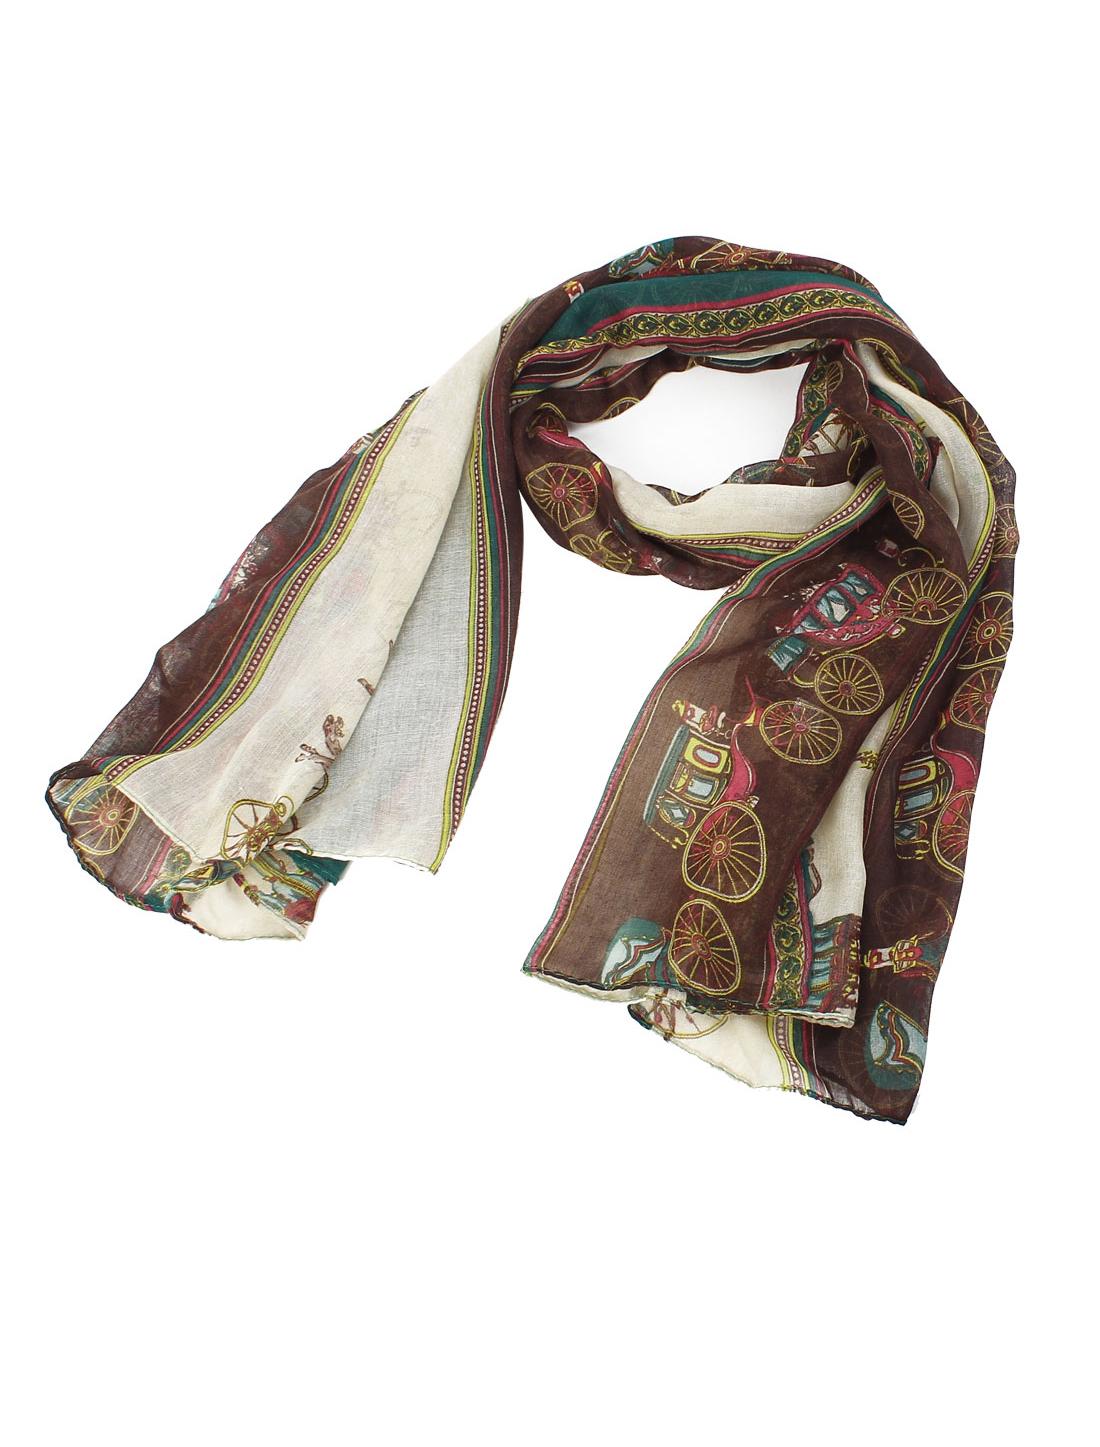 Women Fashion Soft Fabric Palace Carriage Print Long Scarf Shawl Wrap Multicolor